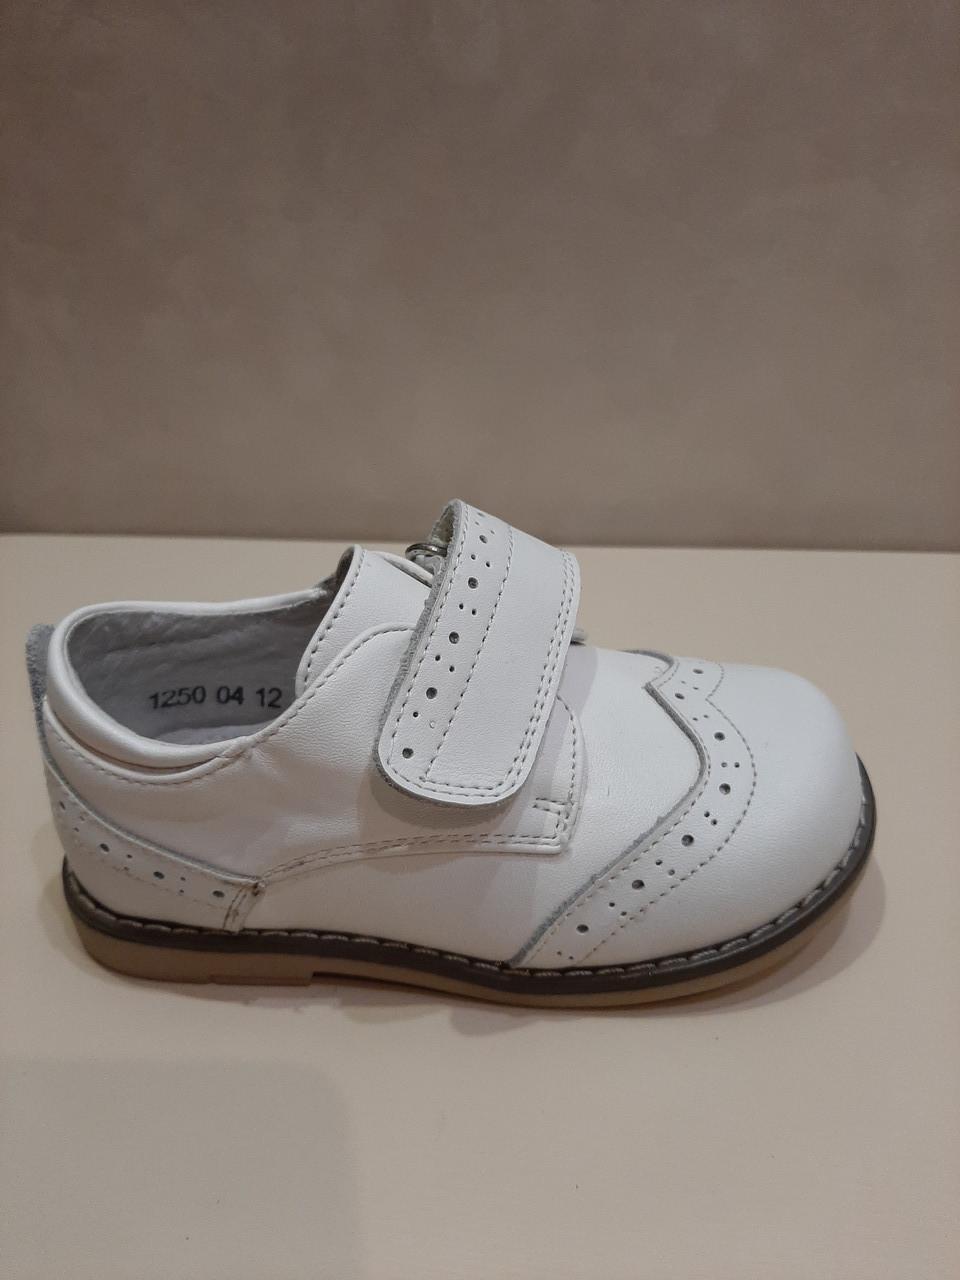 Туфли детские р.24,25 ТМ Шалунишка